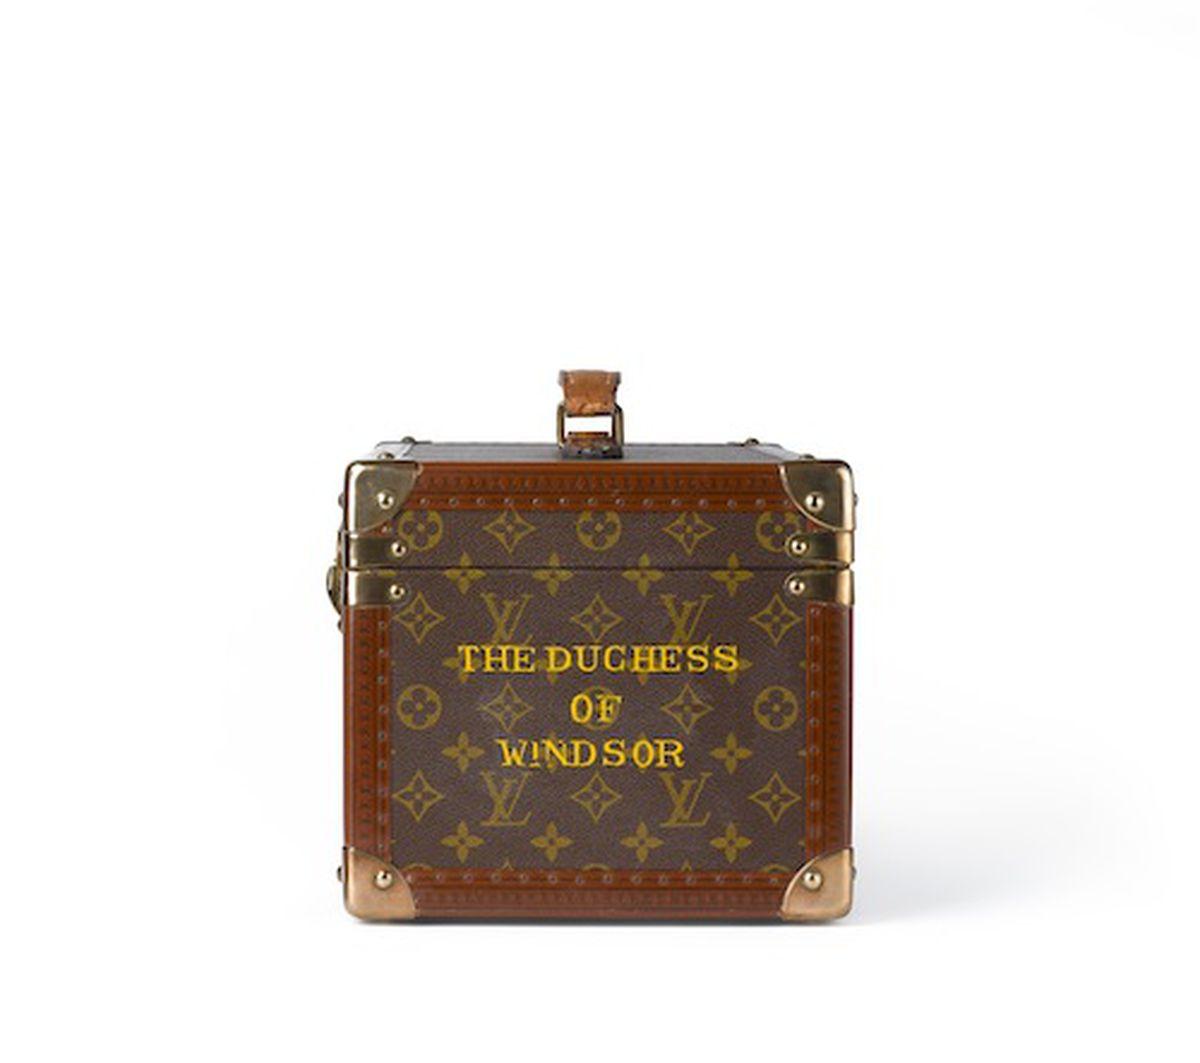 Most Por Louis Vuitton Handbags Best Handbag 2018